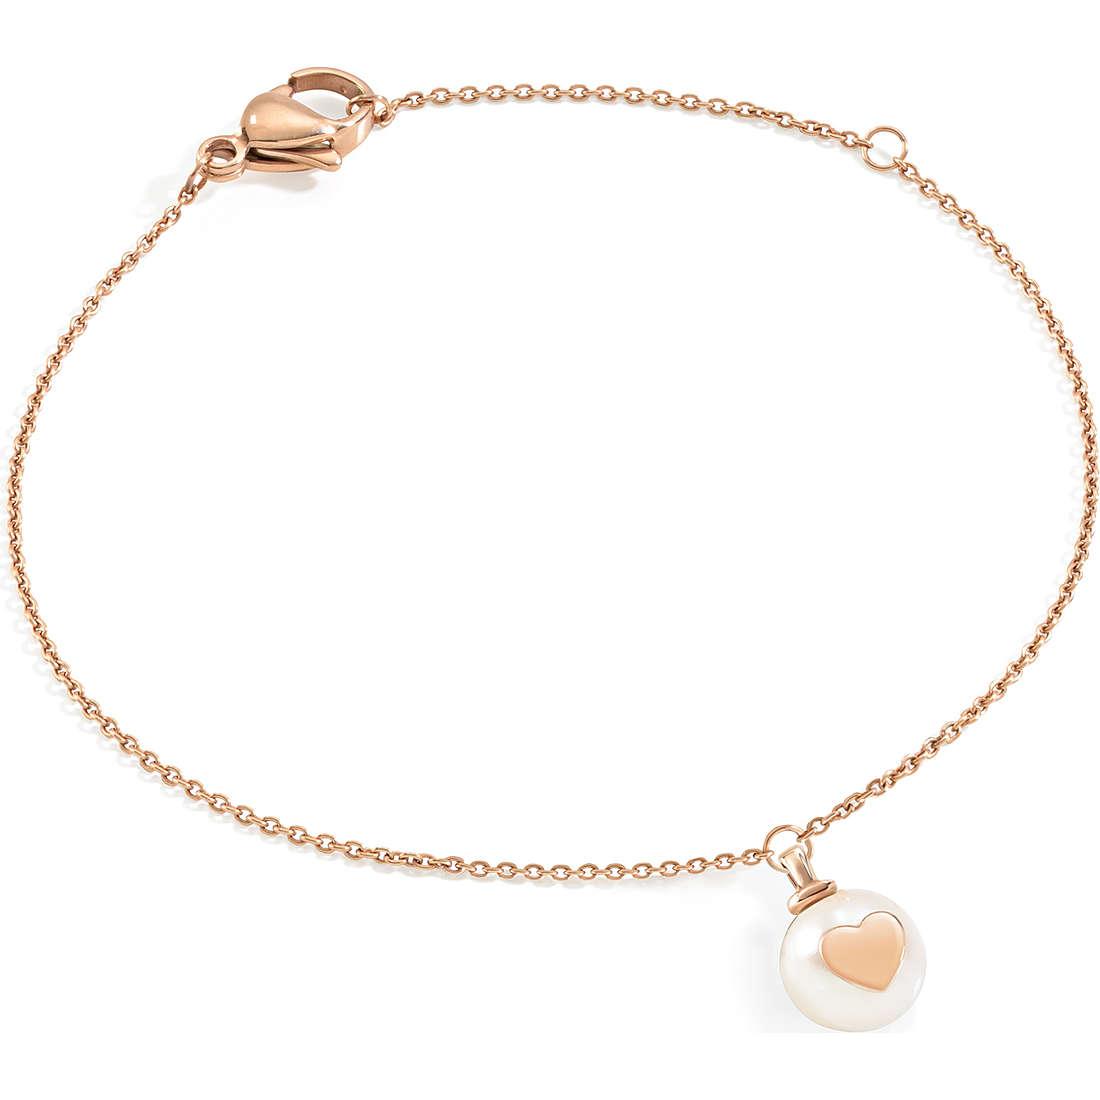 bracelet woman jewellery Morellato Le chicche SACQ07